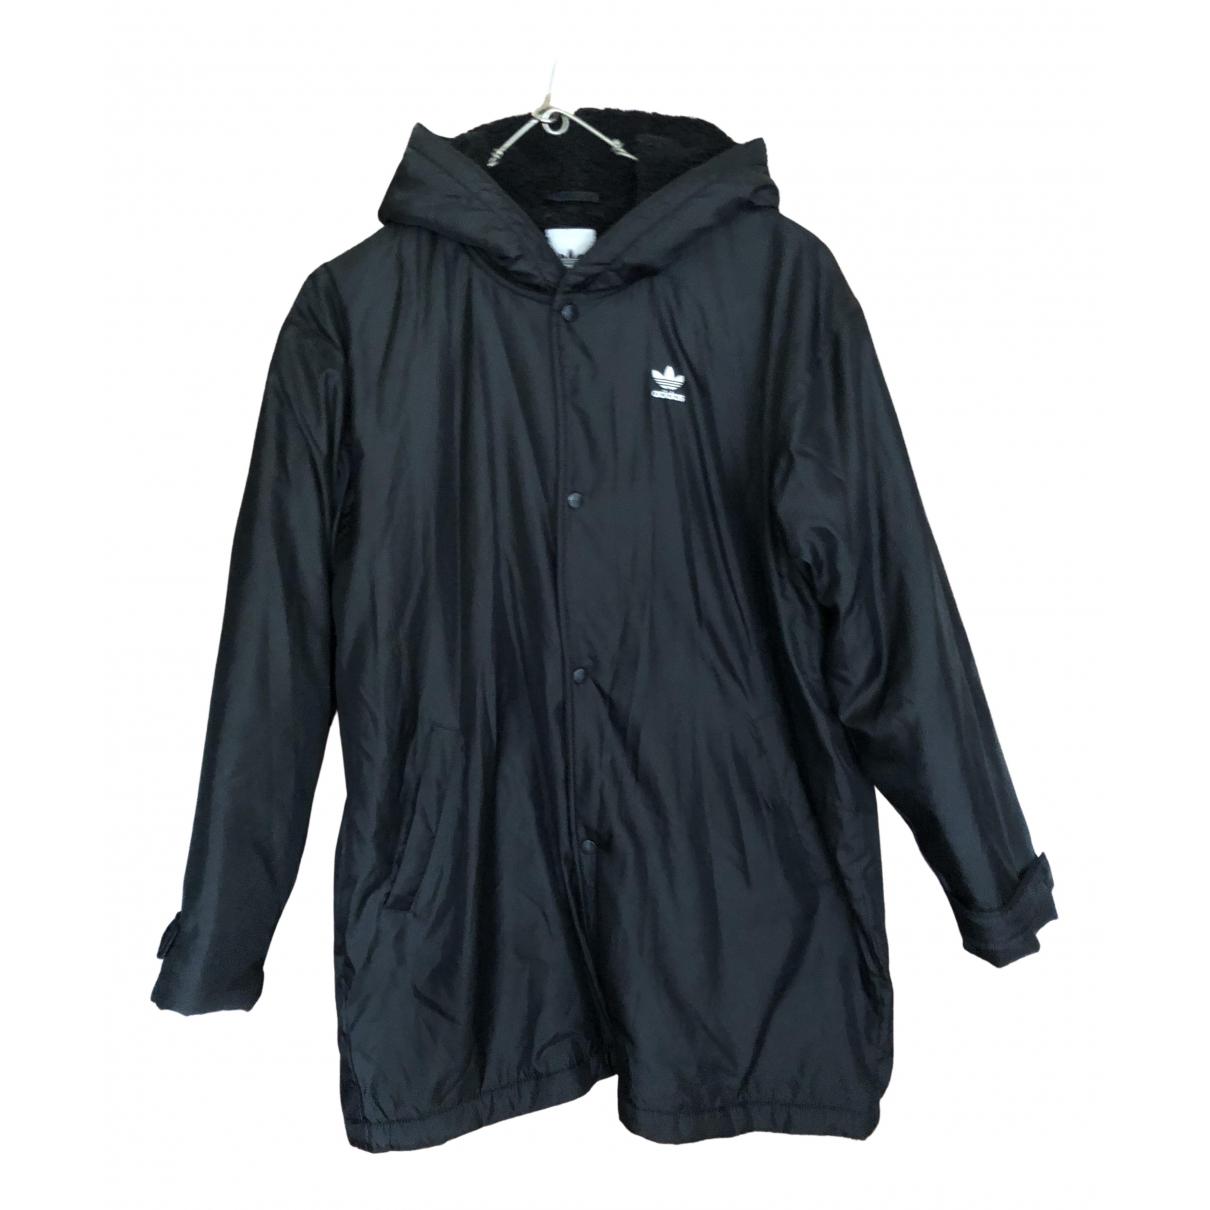 Adidas N Black coat for Women 14 UK